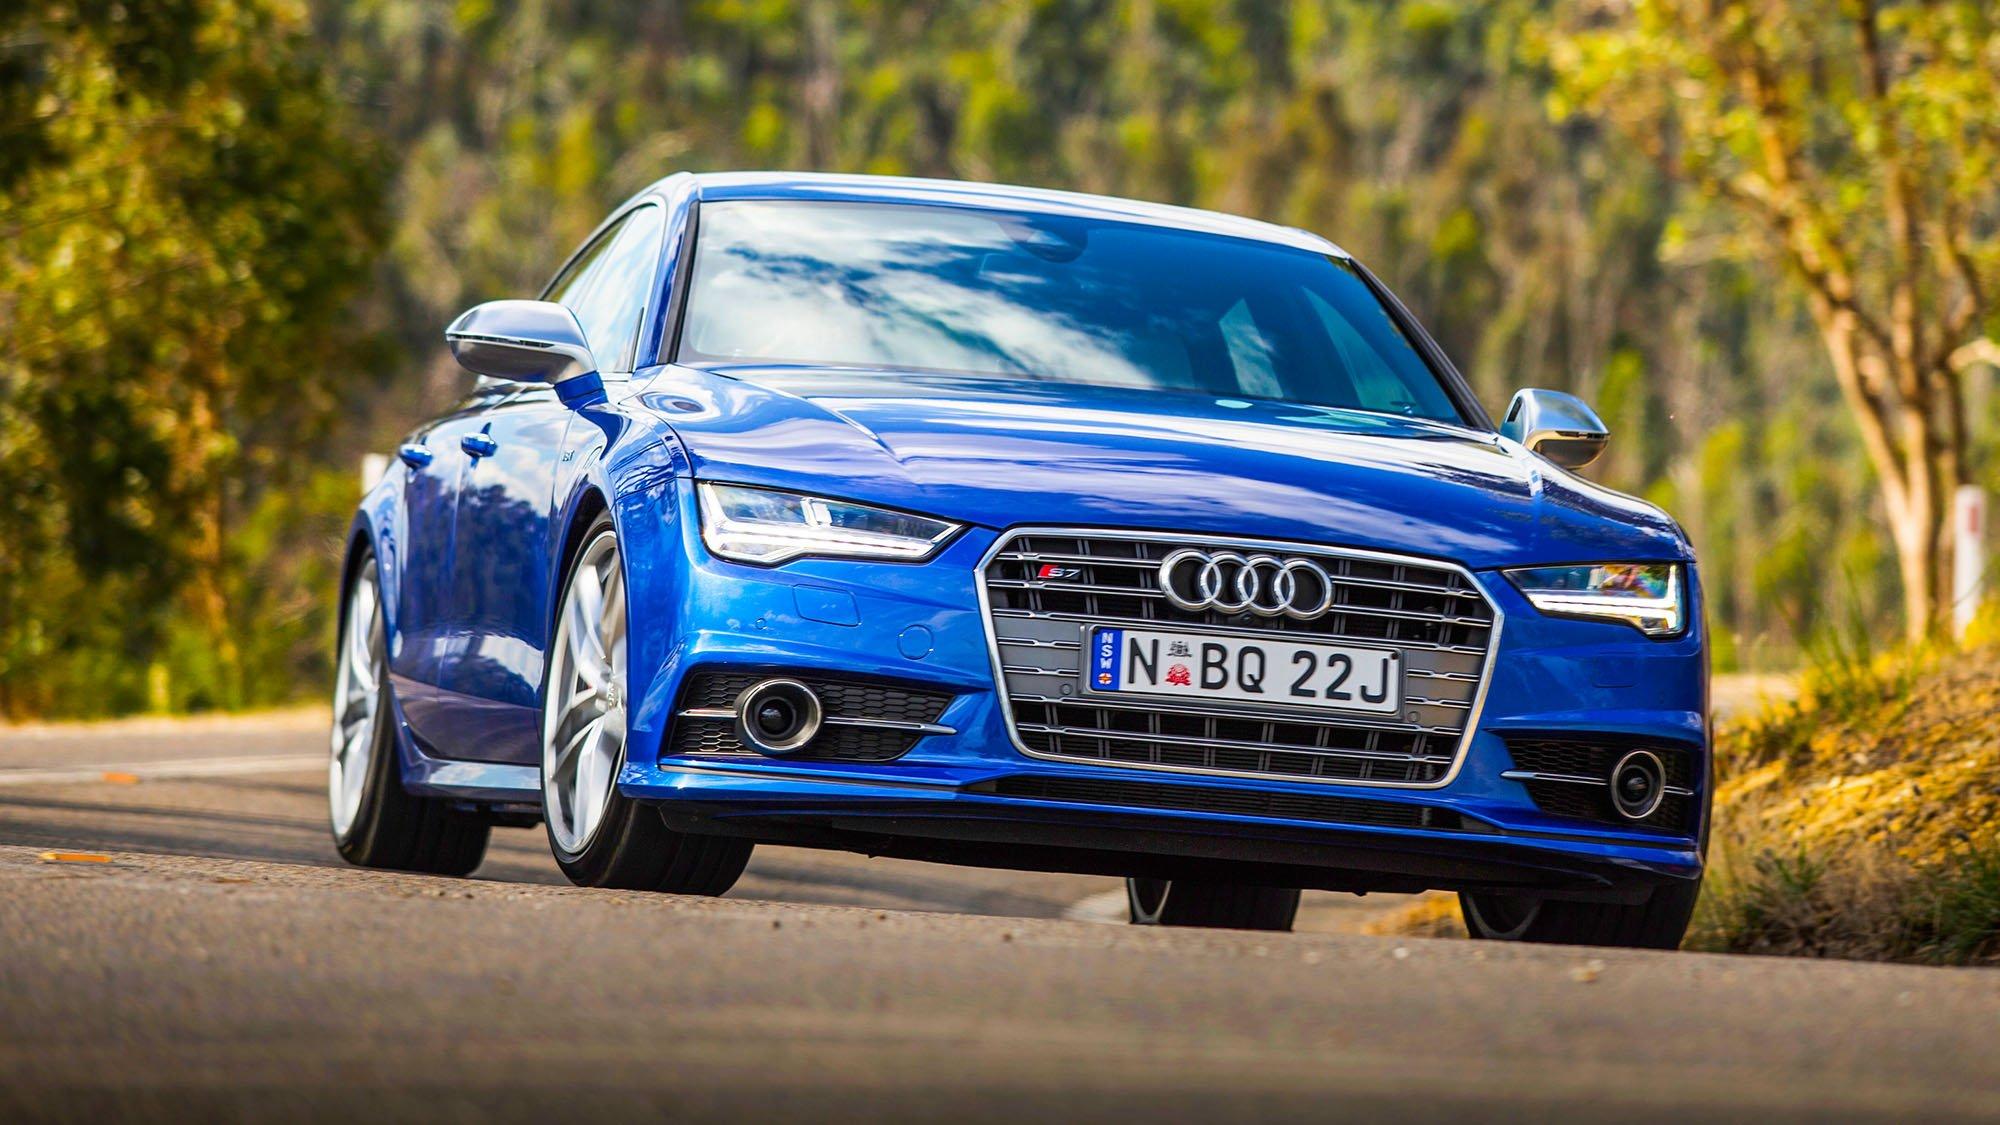 2015 Audi S7 Sportback Review | CarAdvice